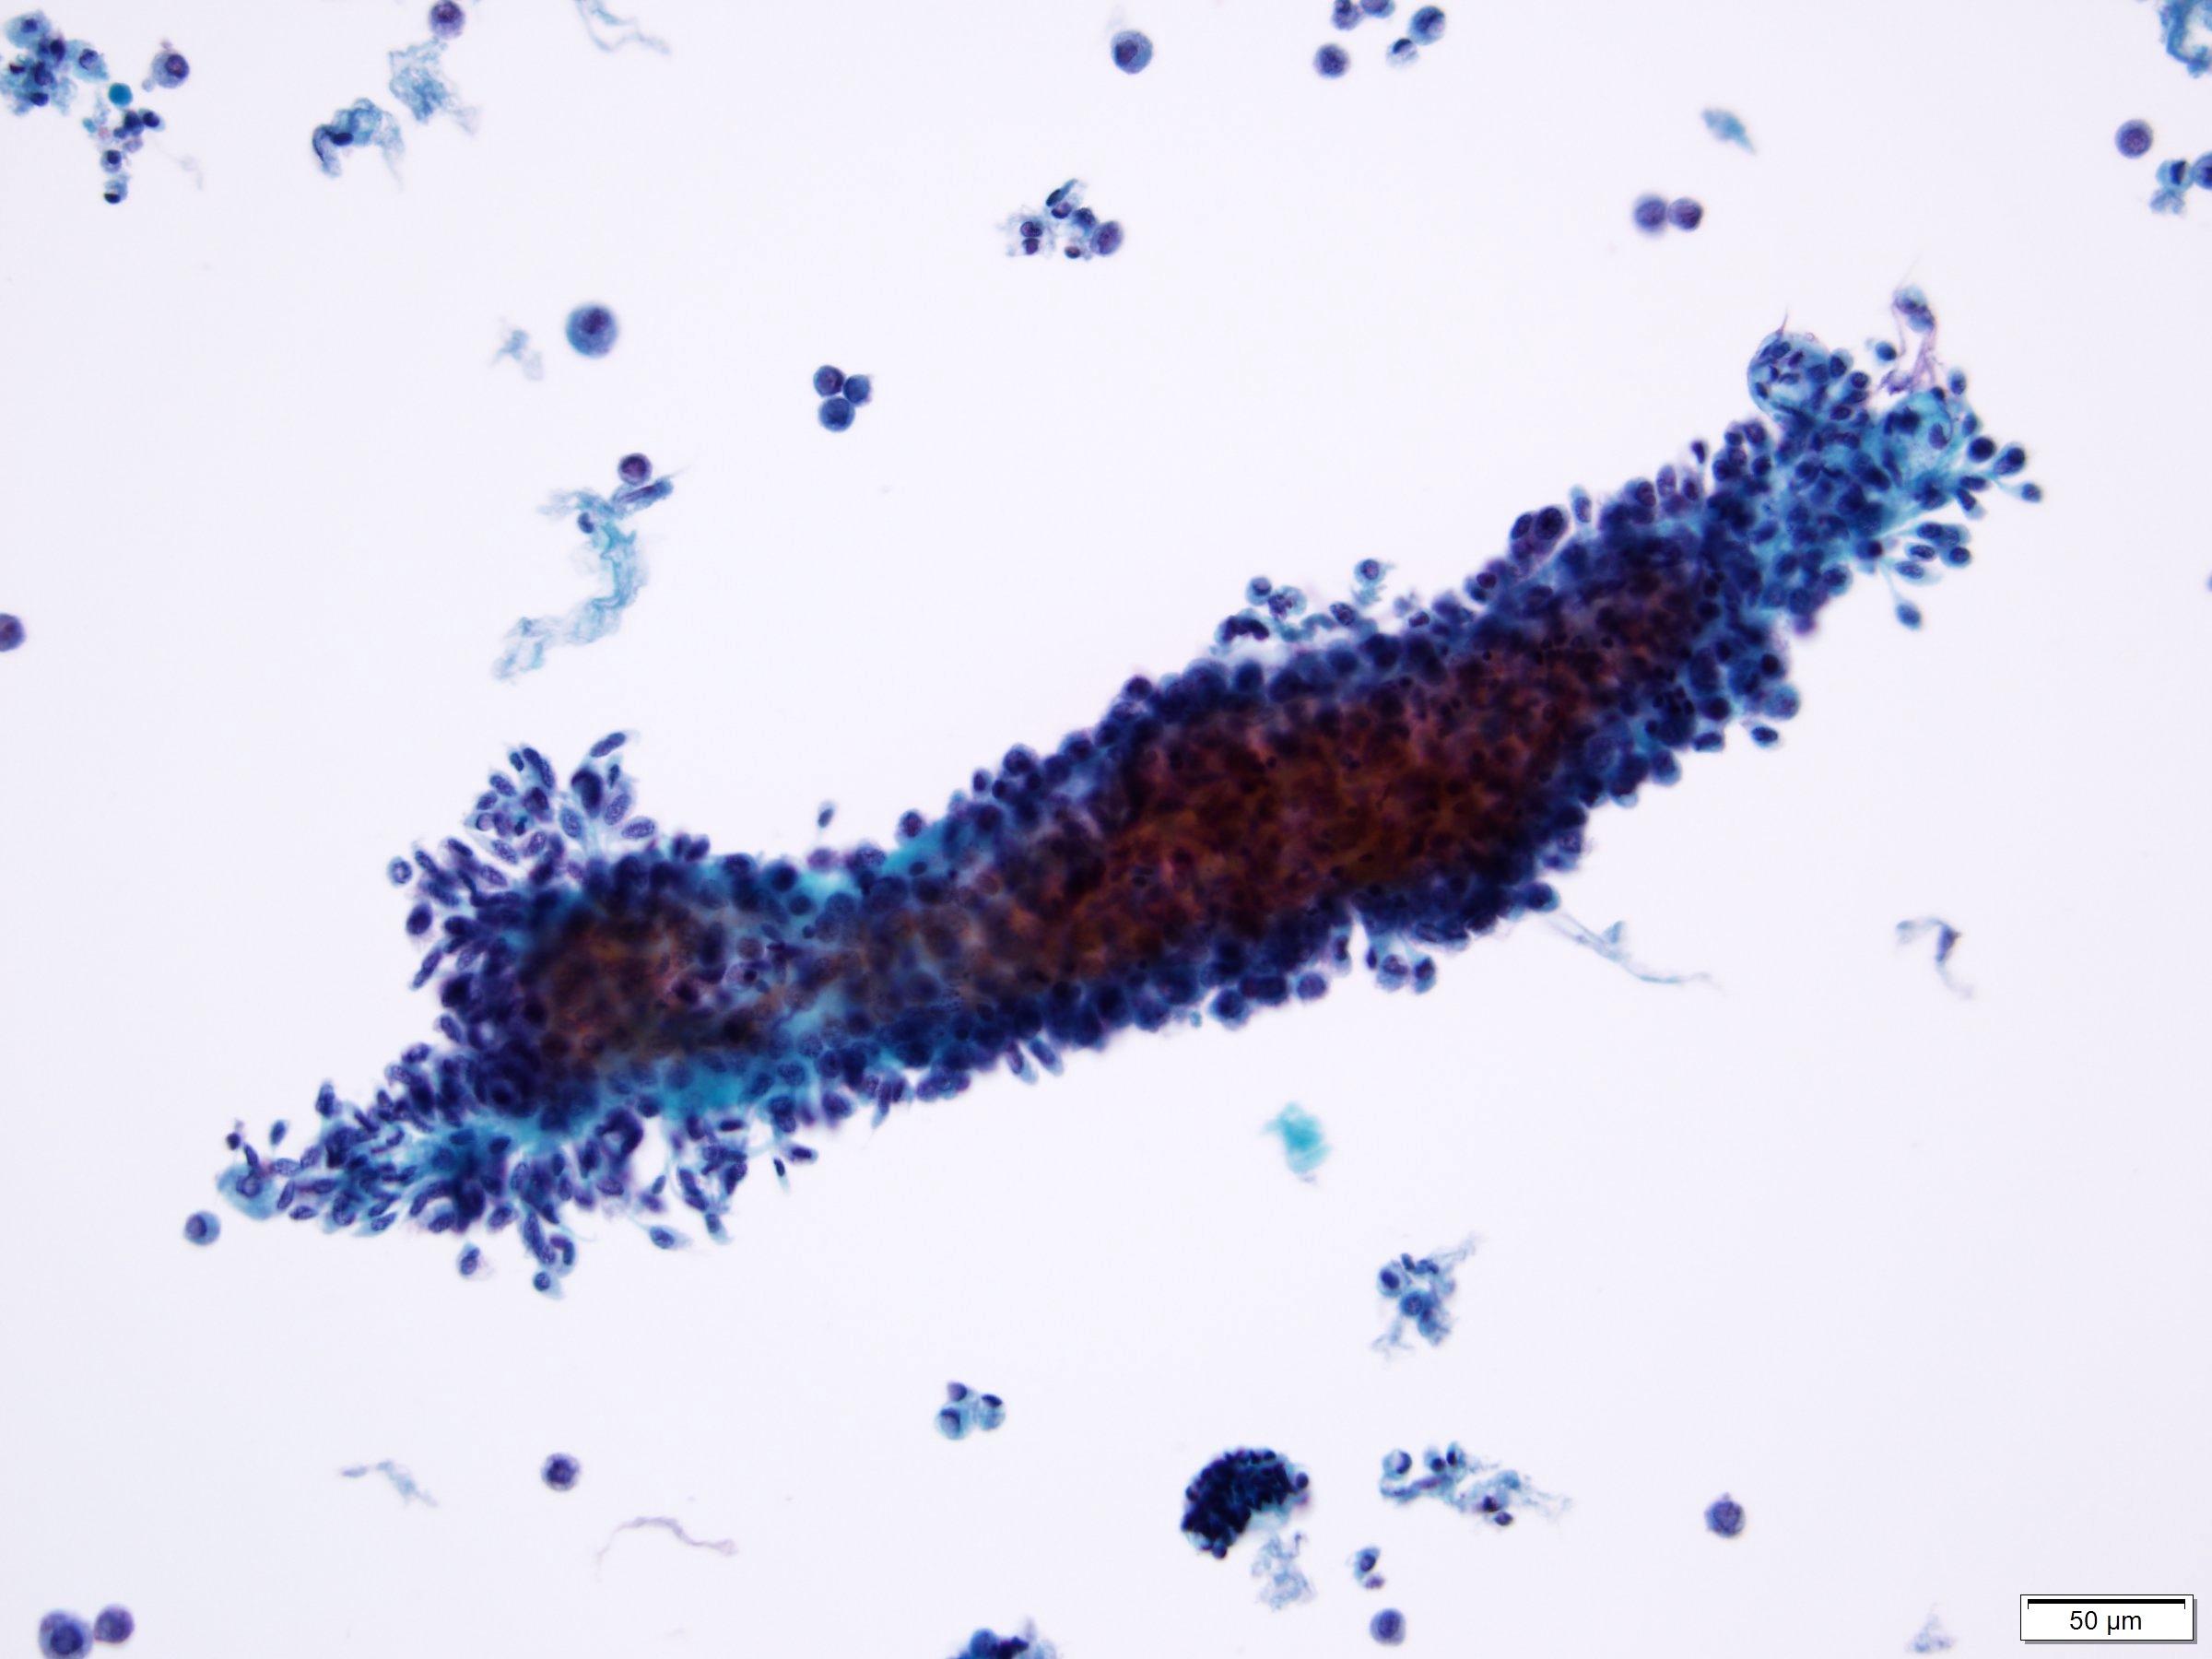 Low grade urothelial neoplasia